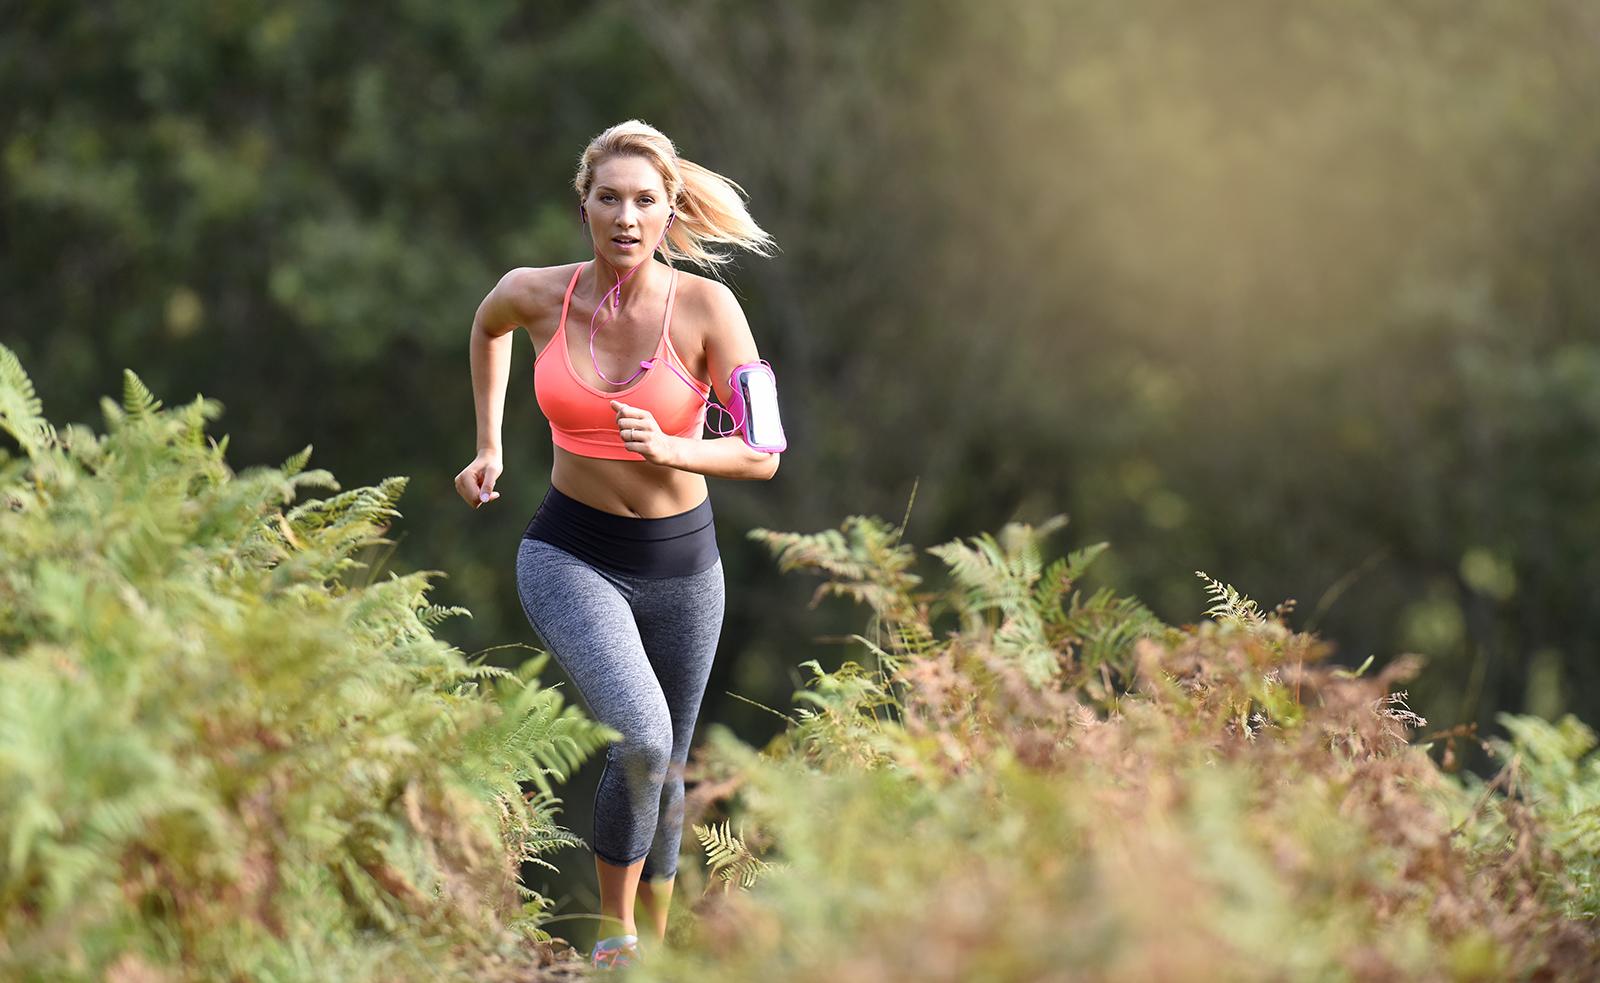 beautiful-woman-running-outside-towards-the-camera